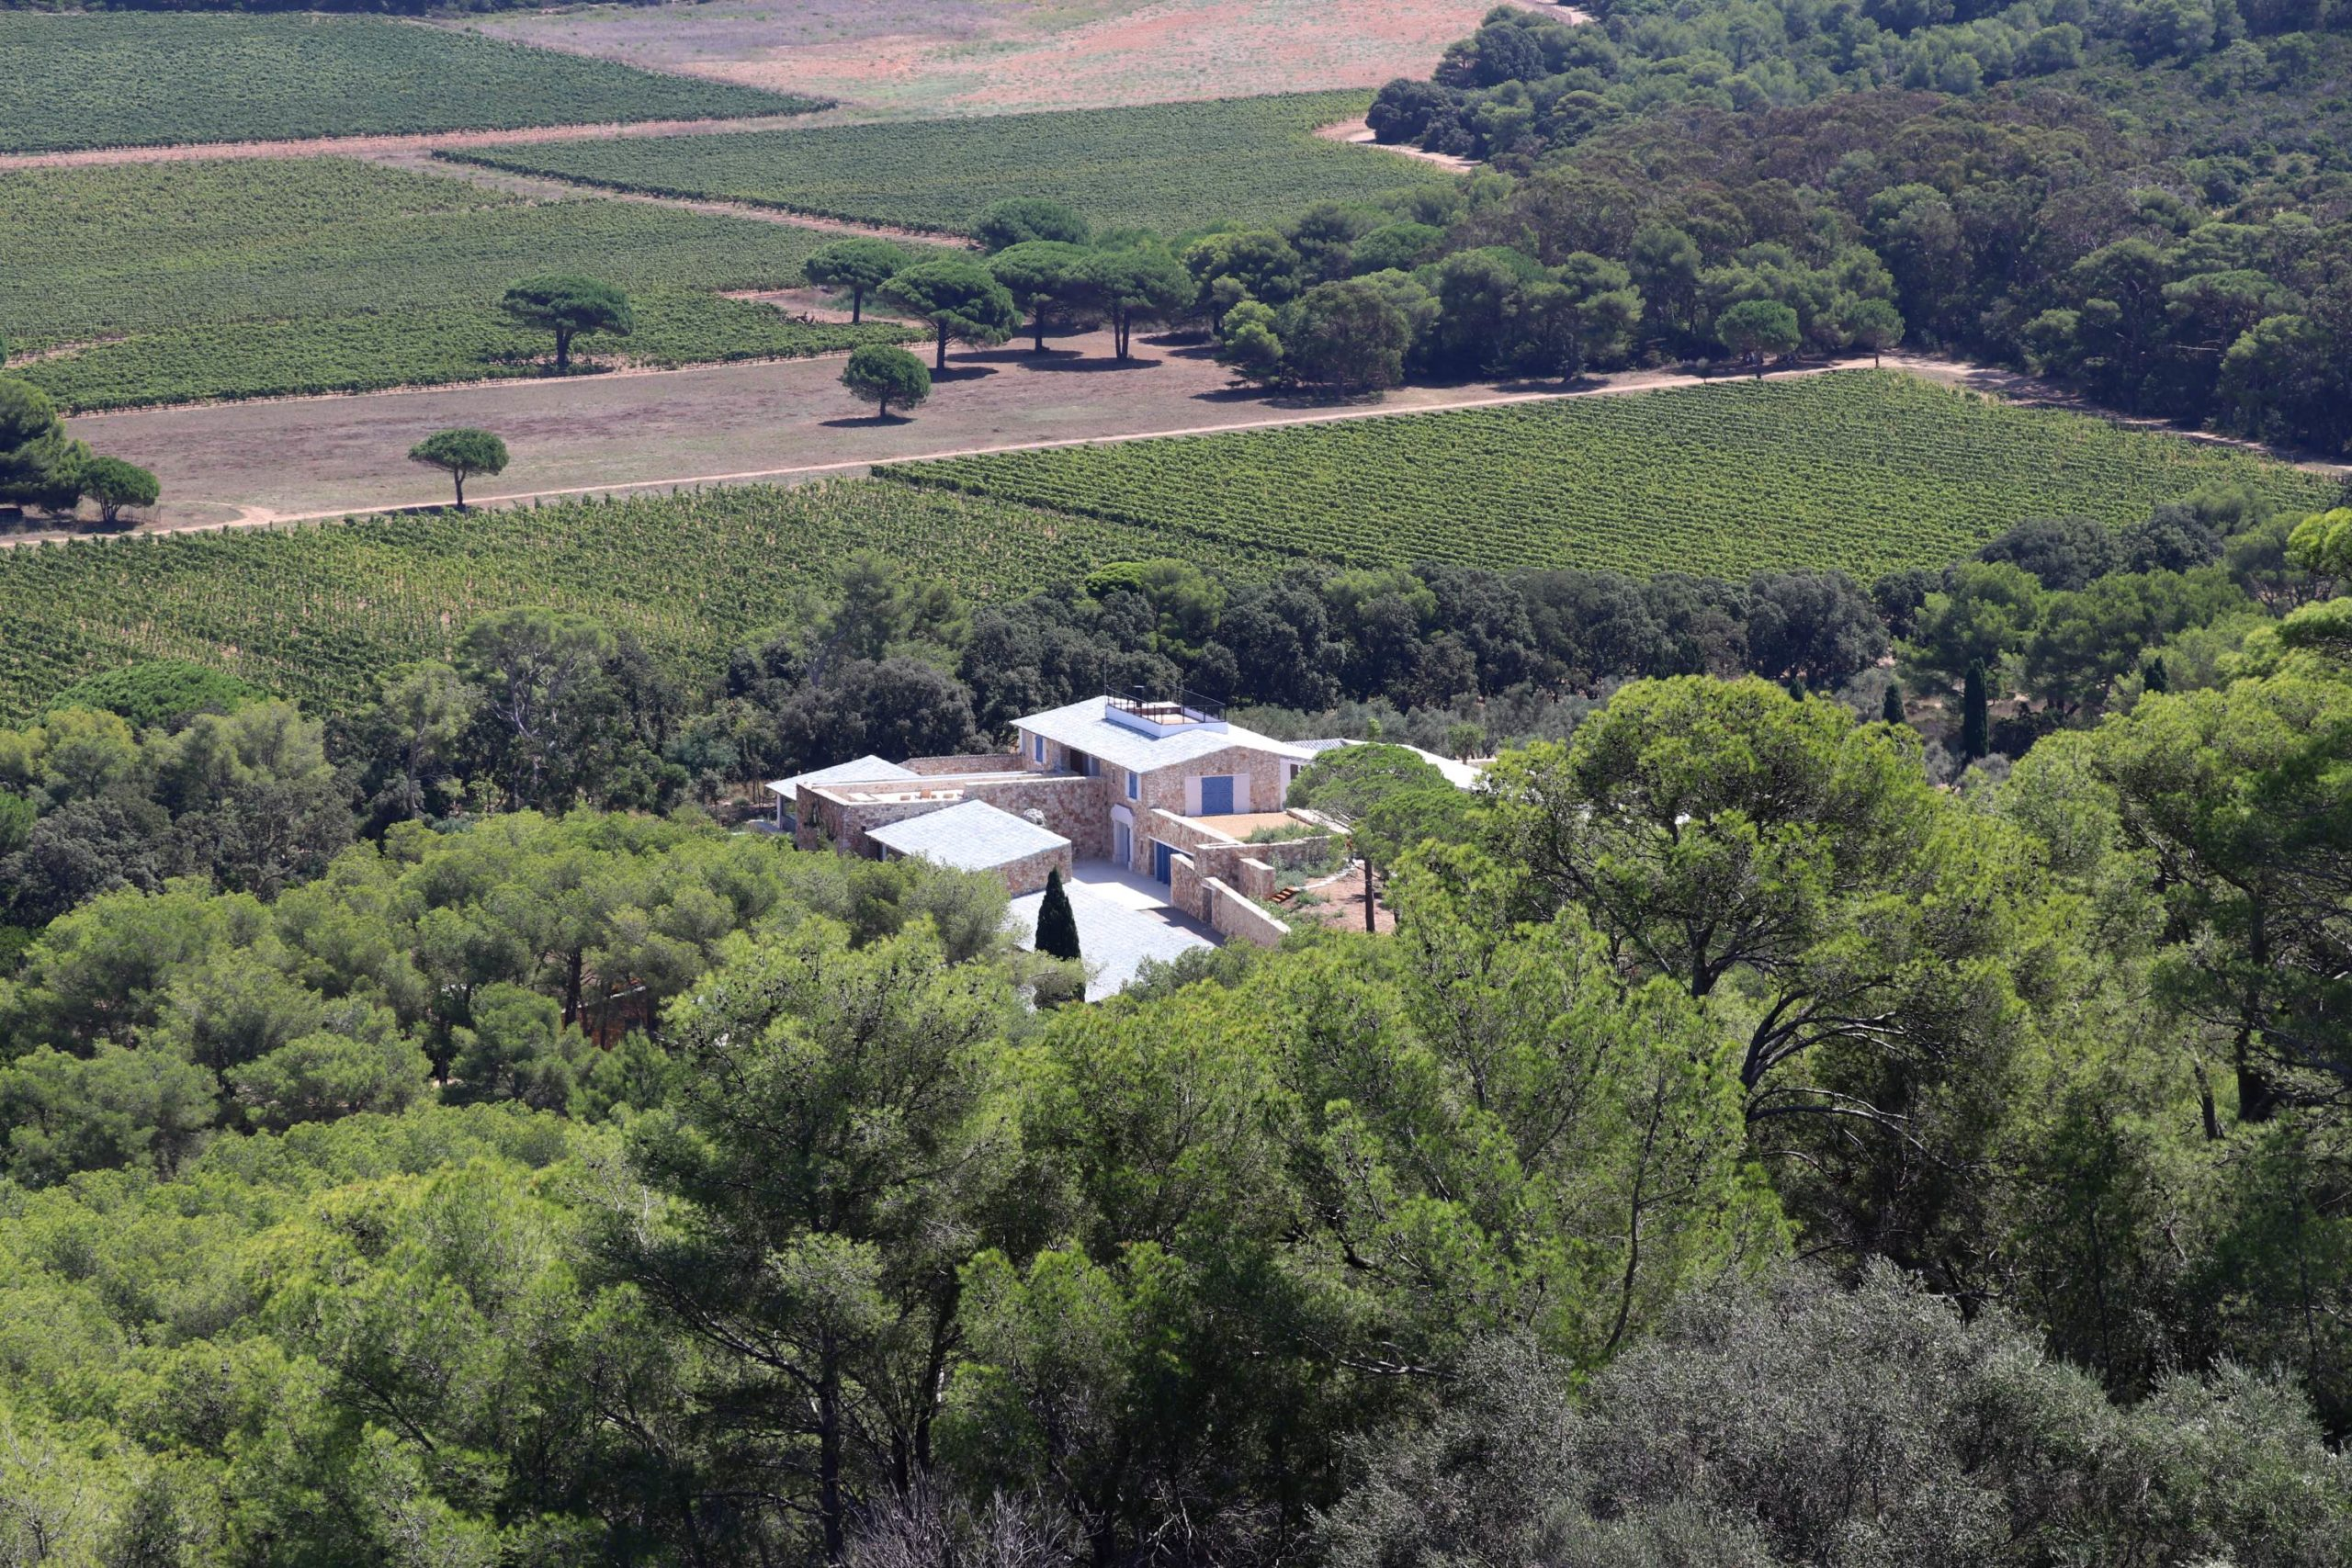 Fondation Carmignac, Porquerolles © CLAD / THE FARM